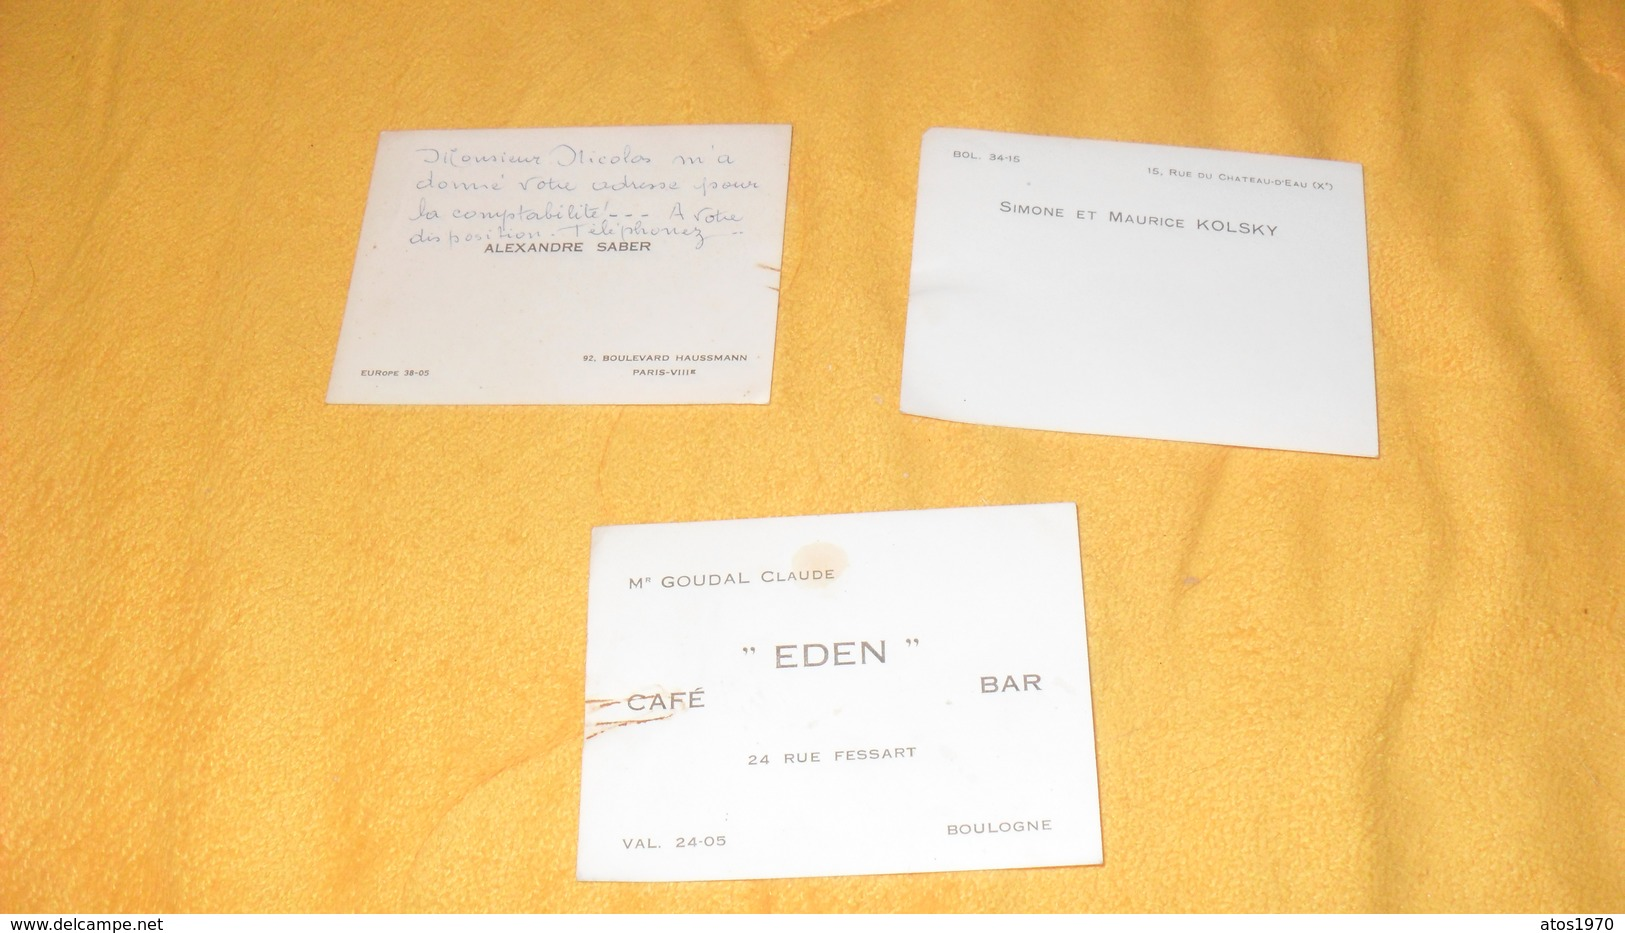 LOT DE 3 CARTES DE VISITES / SIMONE ET MAURICE KOLSKY, ALEXANDRE SABER, MR GOUDAL CLAUDE EDEN CAFE BAR BOULOGNE... - Visitenkarten